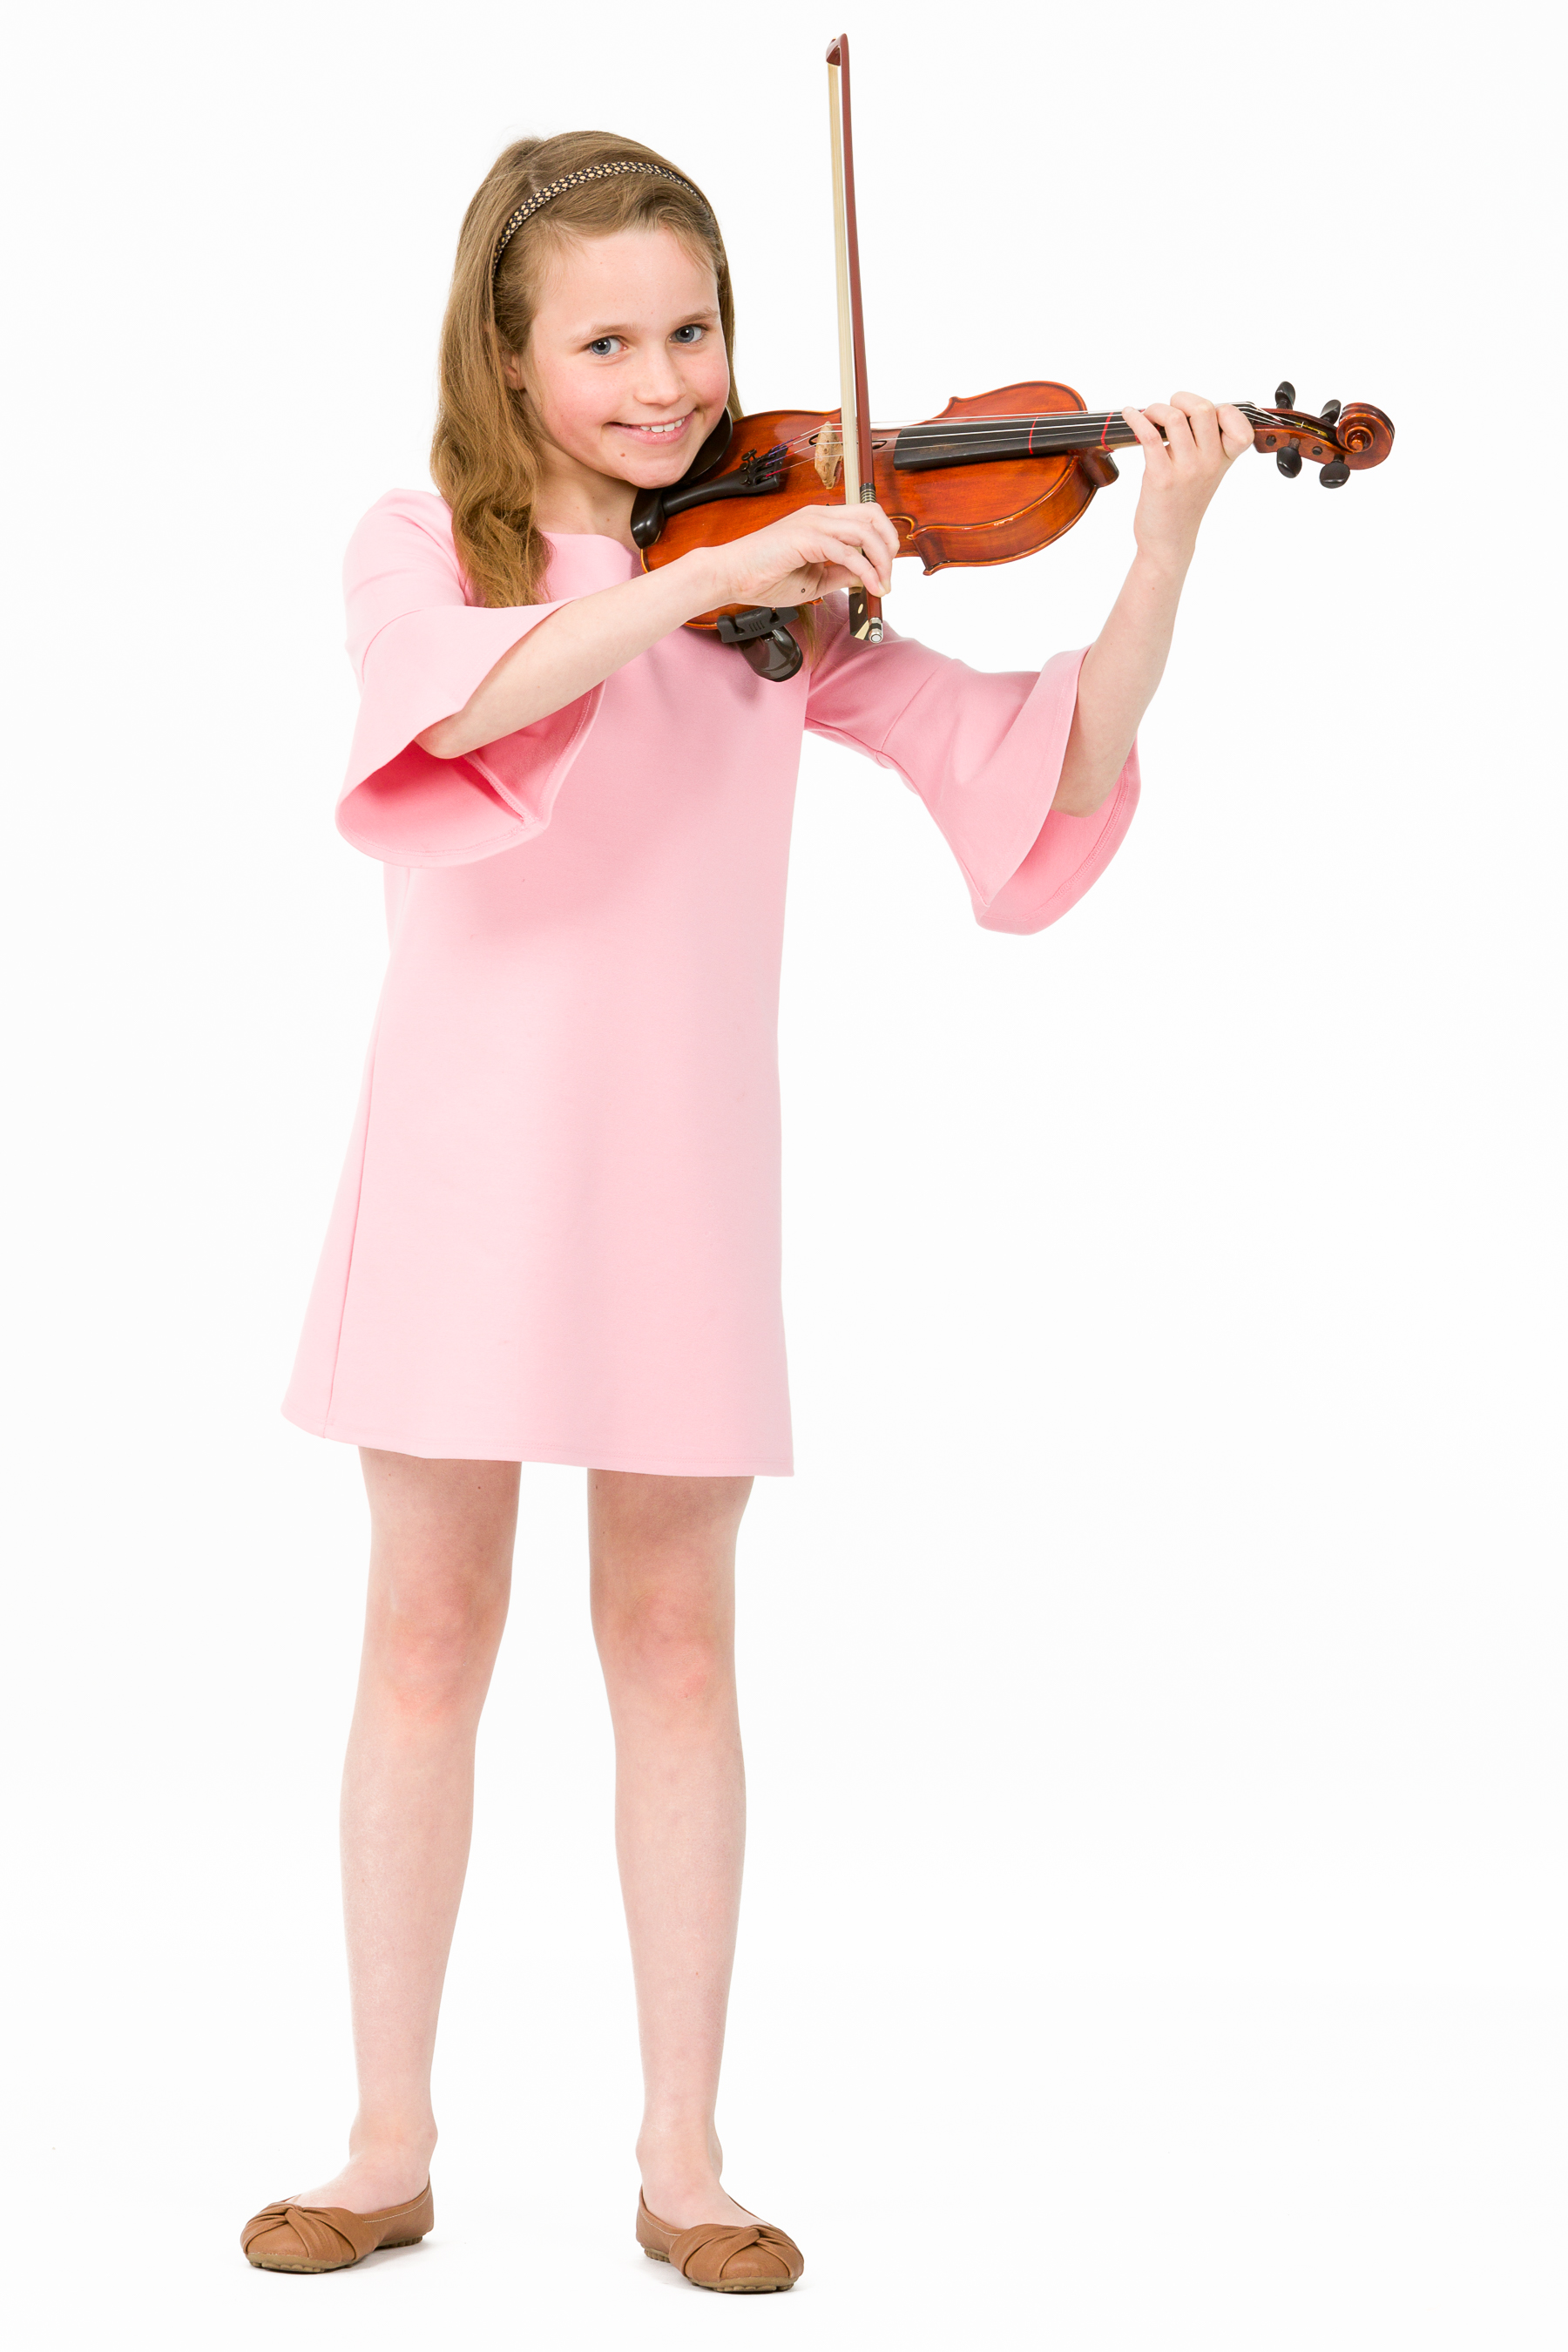 Violin__5DIV5640-1.jpg